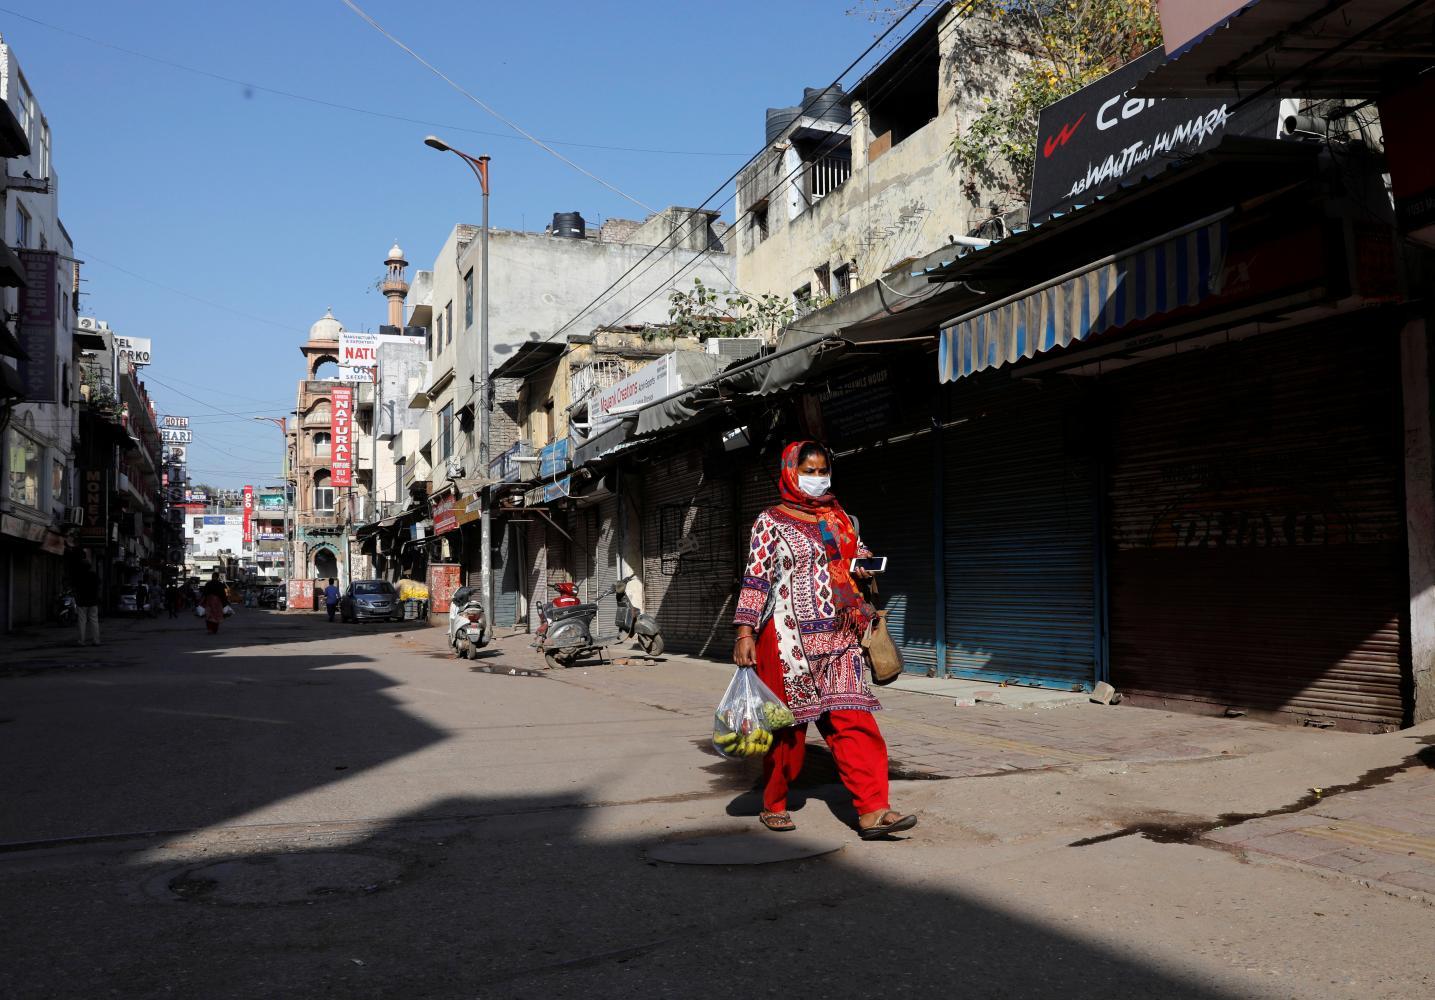 A woman walks along a near-empty street in New Delhi during a lockdown in March. Photo: ADNAN ABIDI/REUTERS